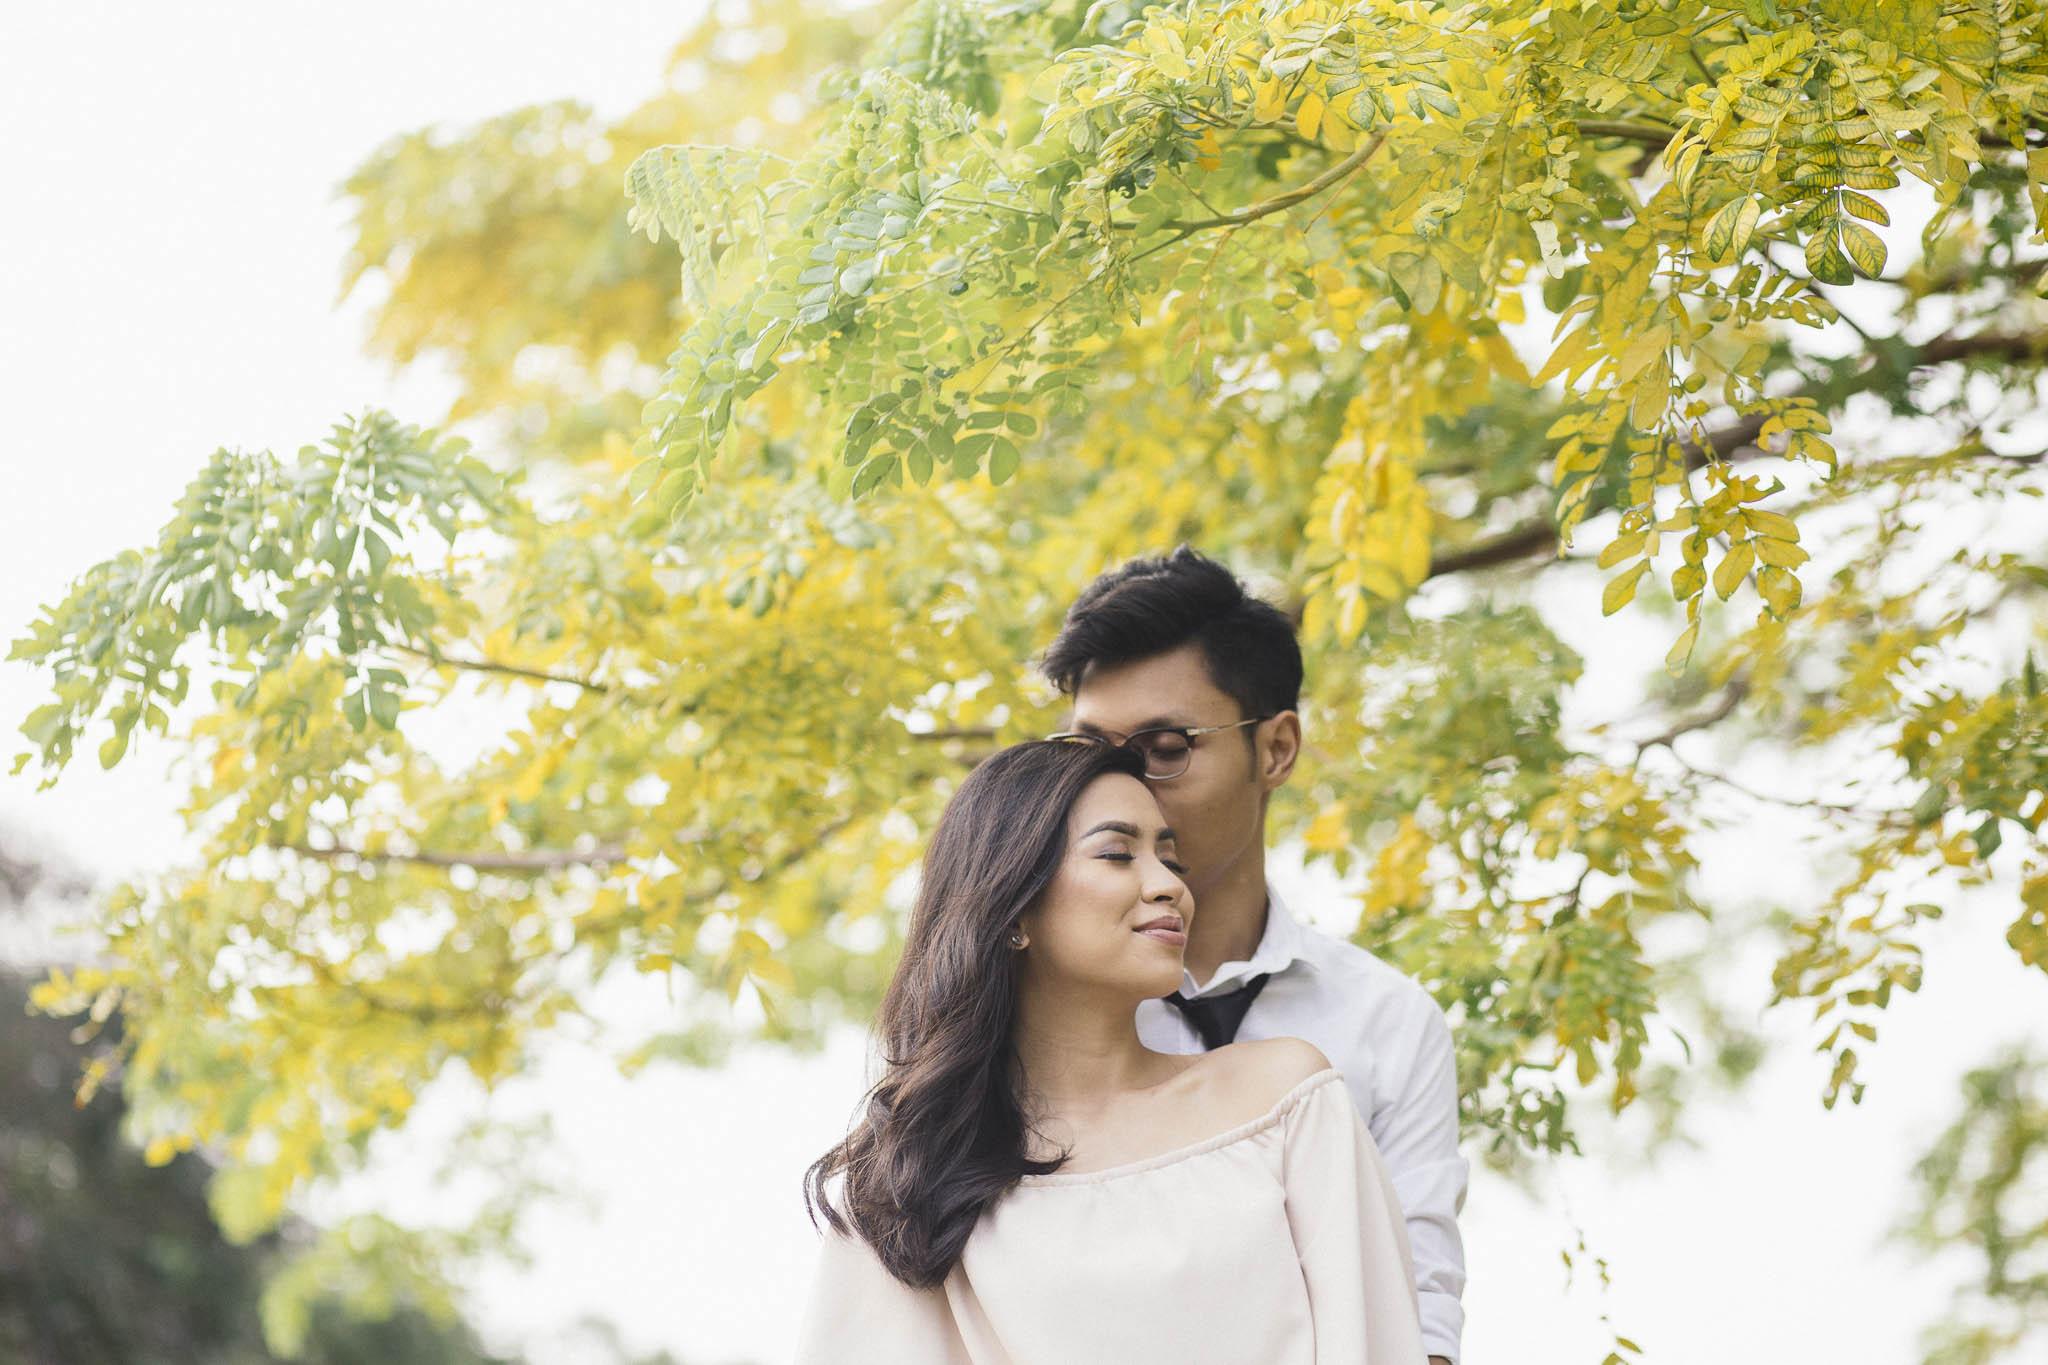 singapore-wedding-photographer-malay-indian-pre-wedding-travel-wmt-2015-03.jpg